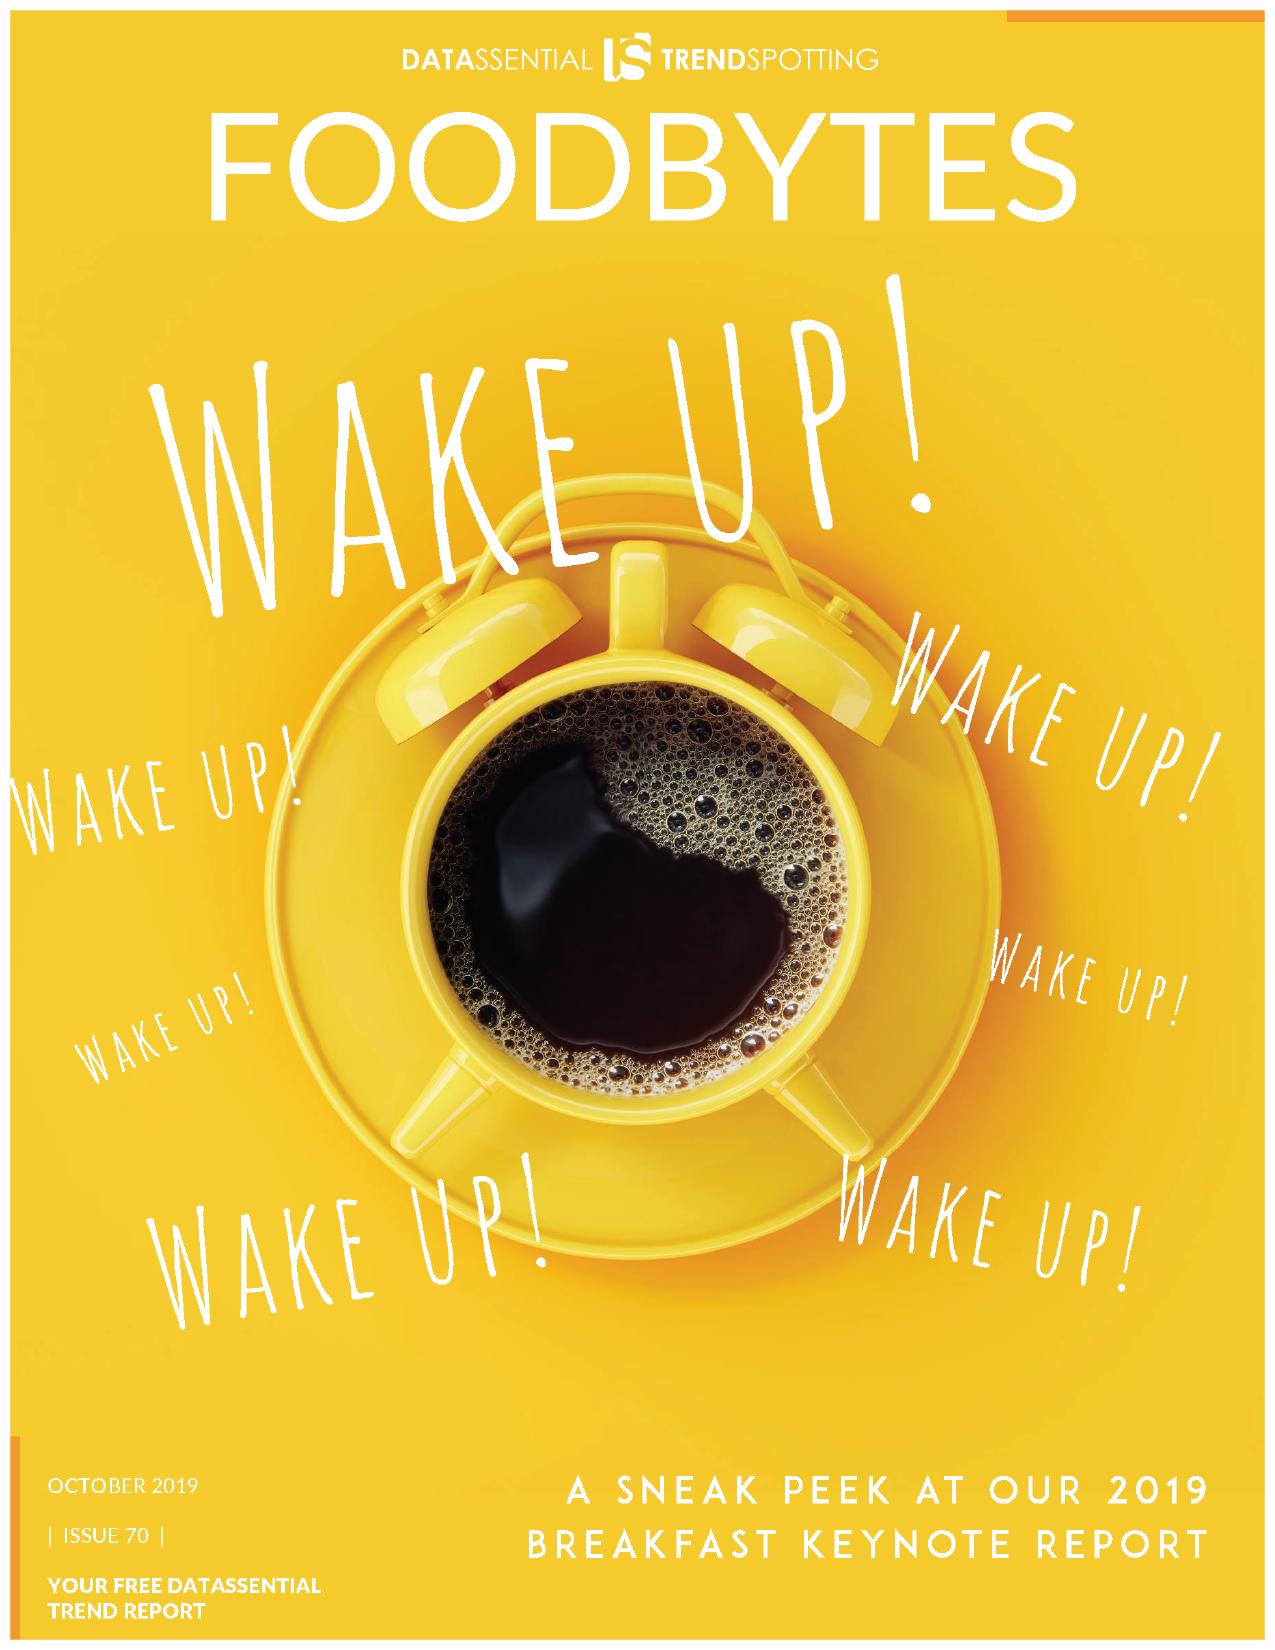 breakfast food trends foodbytes